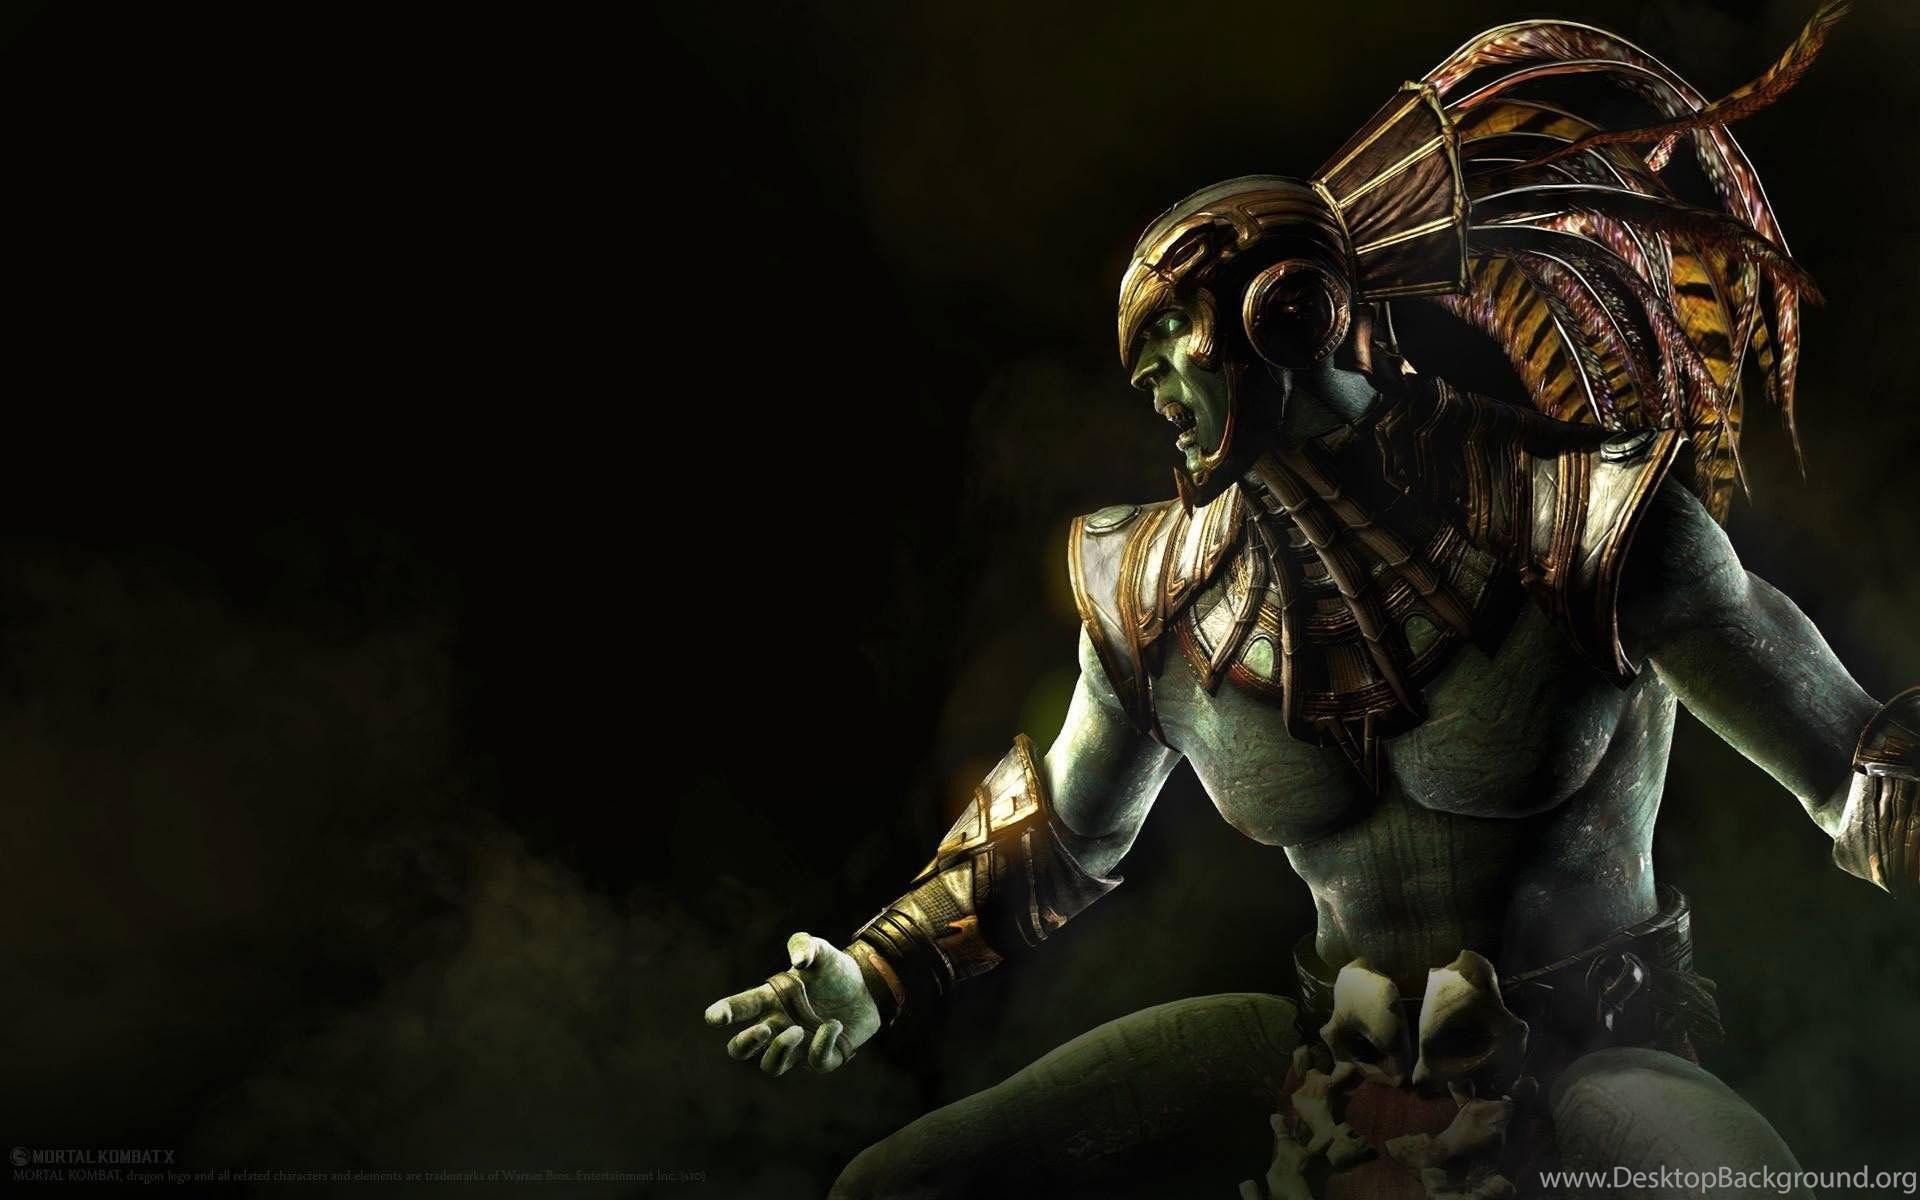 Monster Mortal Kombat X Wallpapers Hd Desktop Background